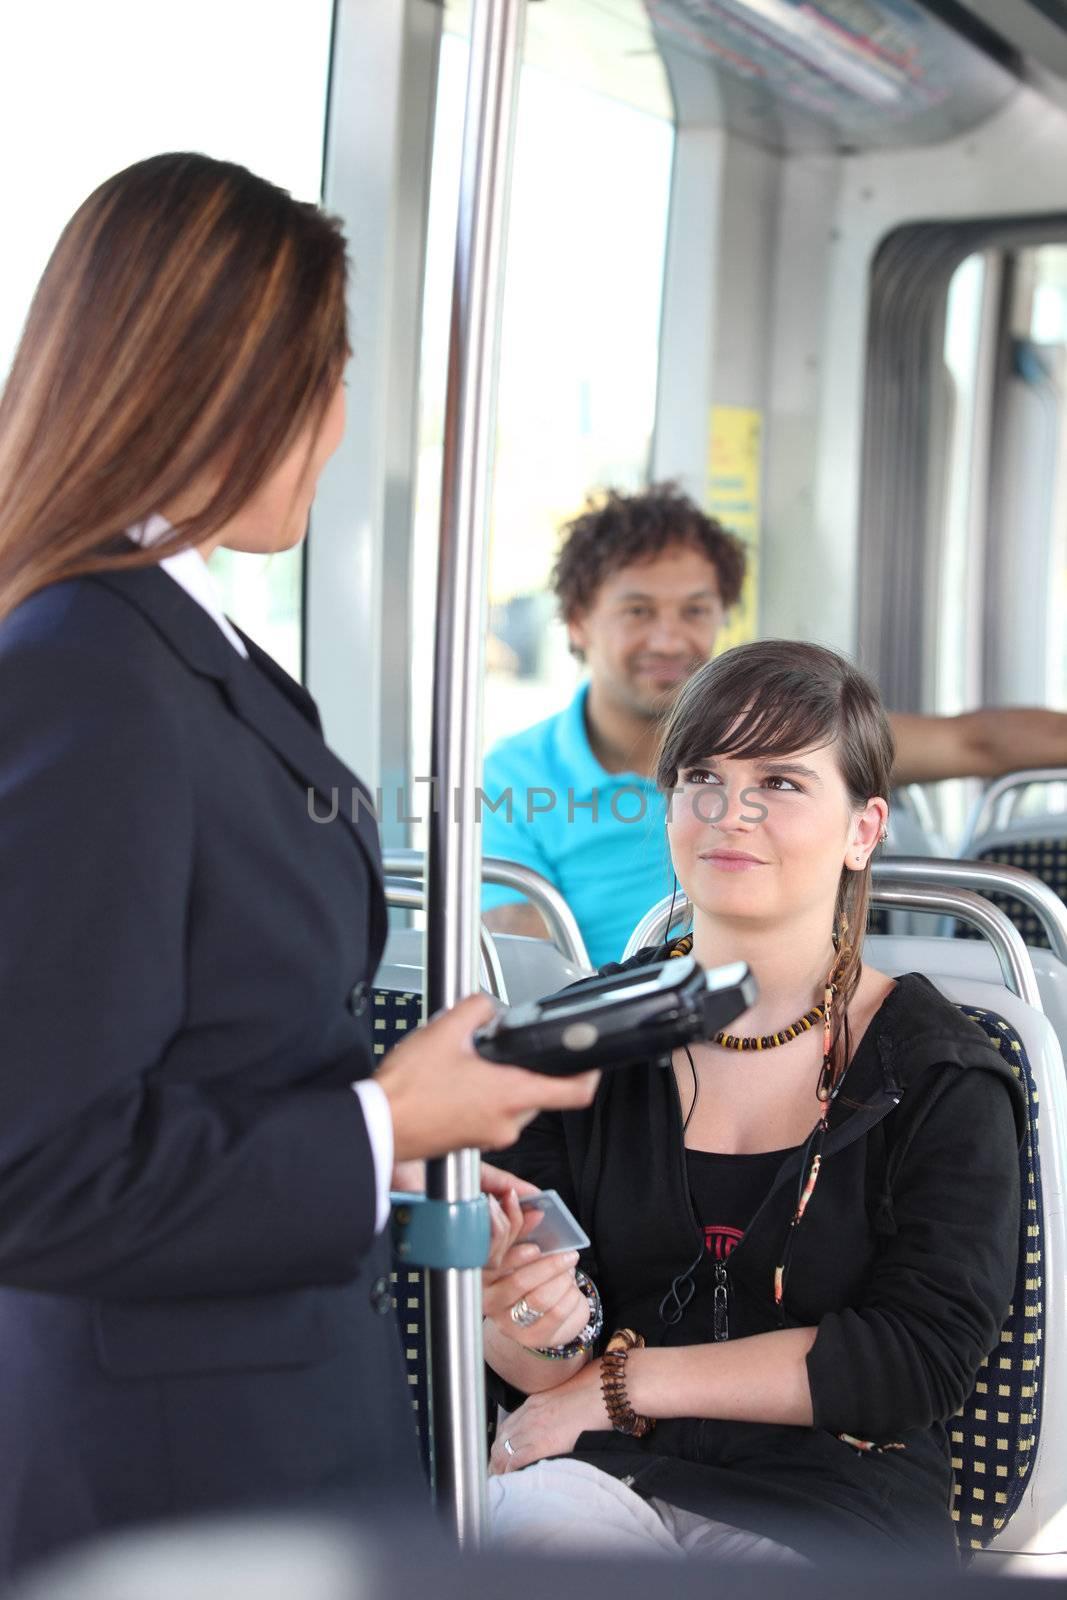 control of transportation ticket